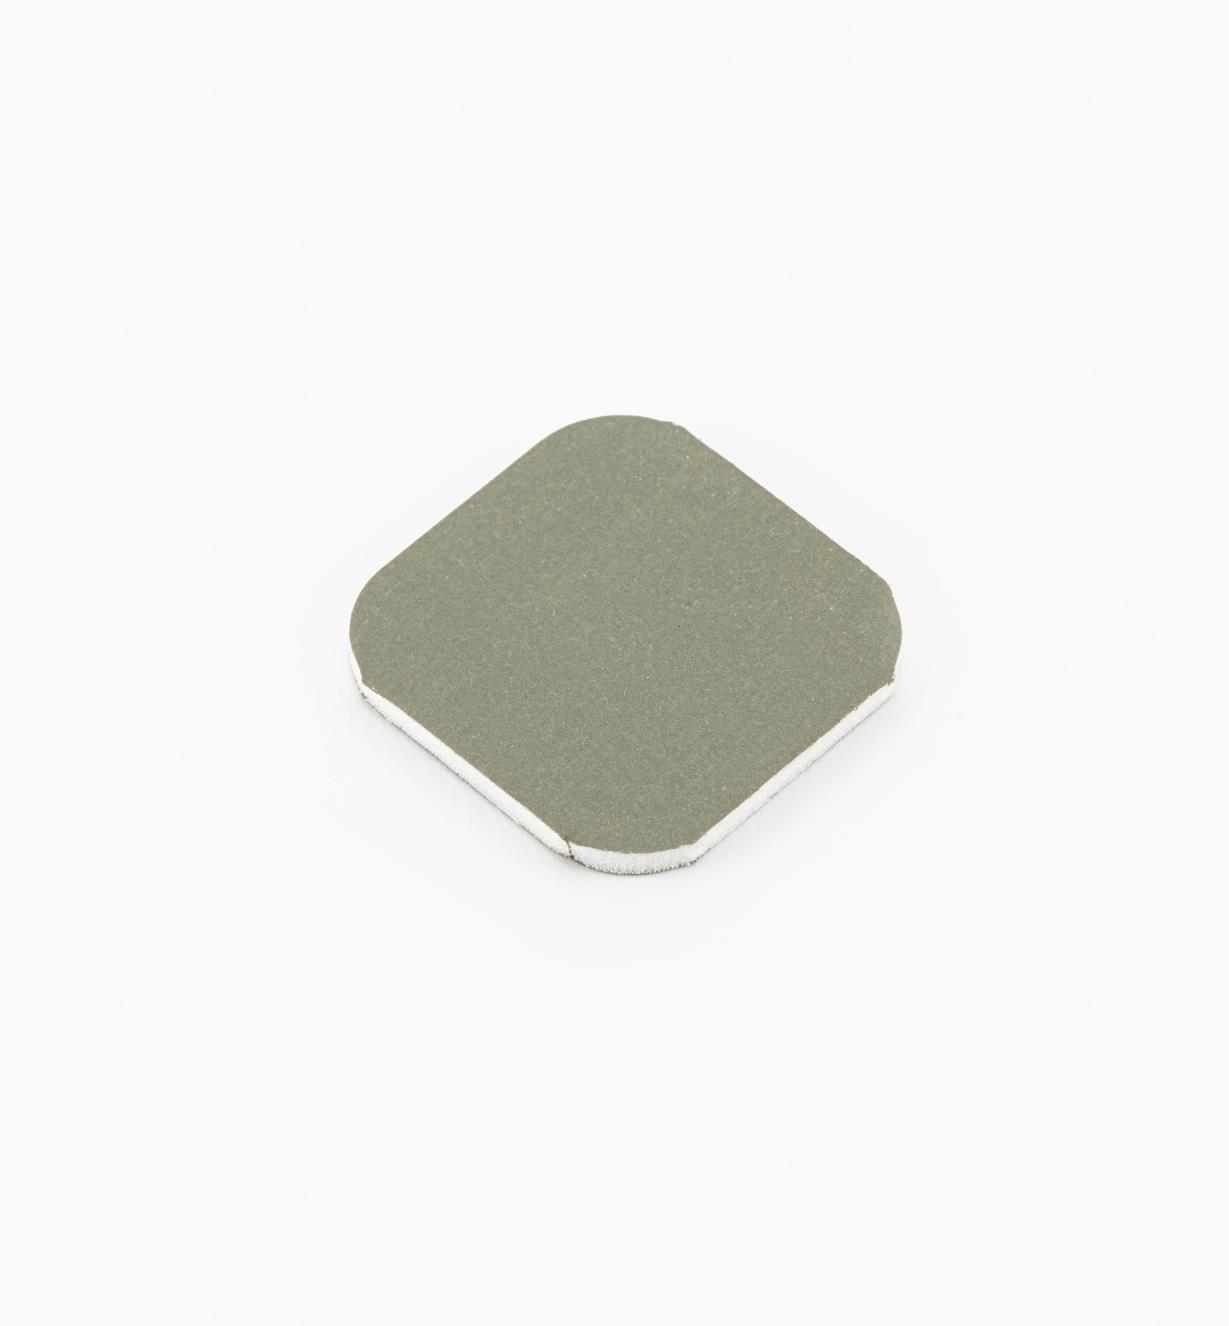 54K9013 - 3200x Micro-Mesh Pen-Sanding Pad, each